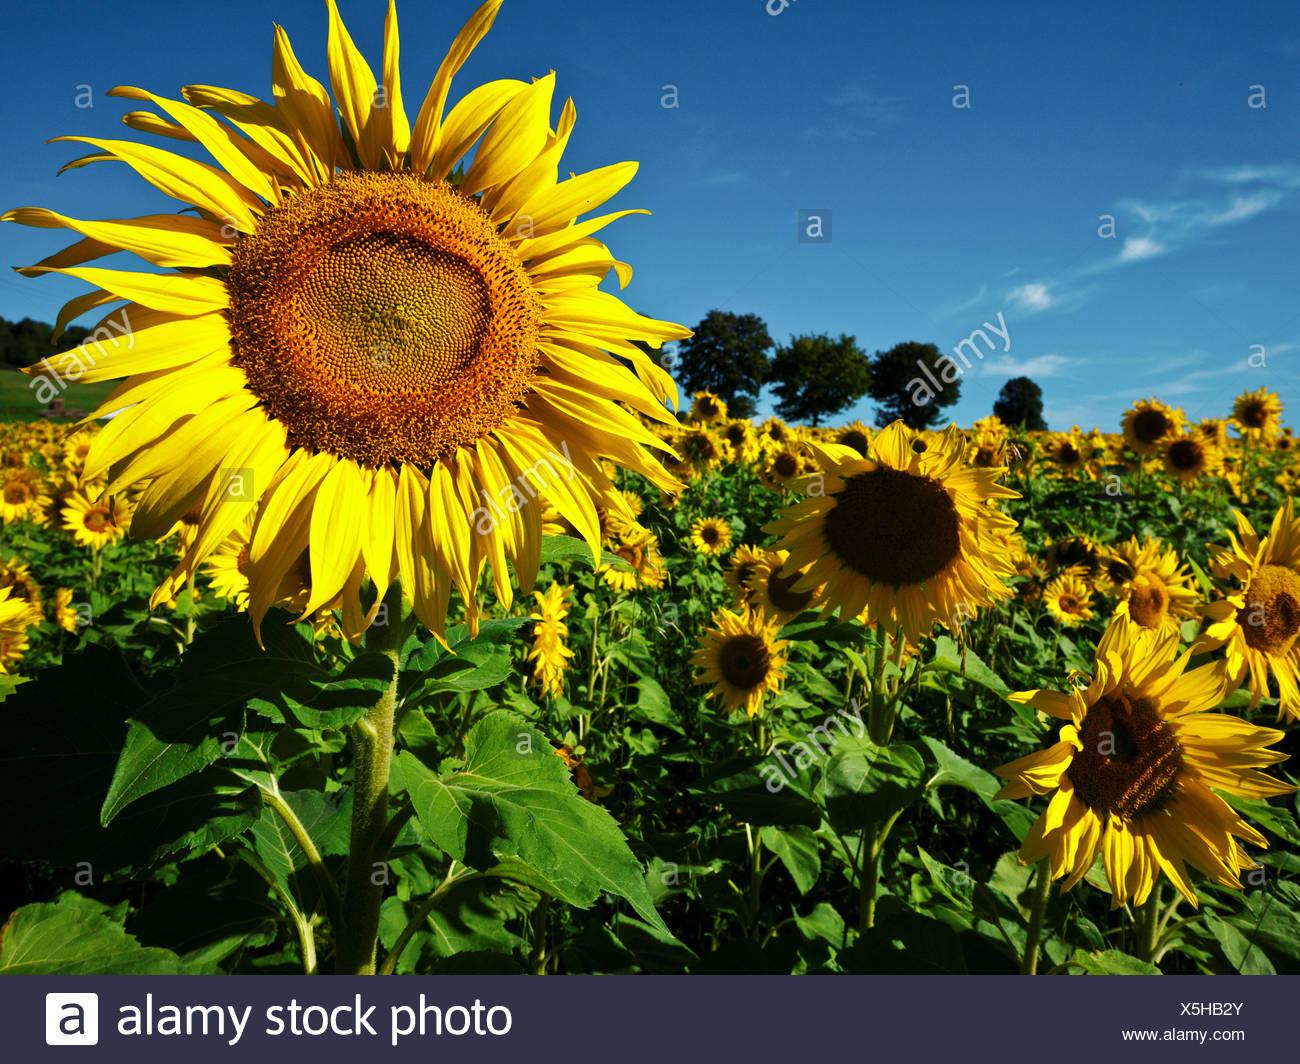 Altmühltal, Nature Park, Asteraceae, Bavaria, Upper Bavaria, Compositae, Germany, Dollnstein, field, yellow, Helianthus annuus, - Stock Image